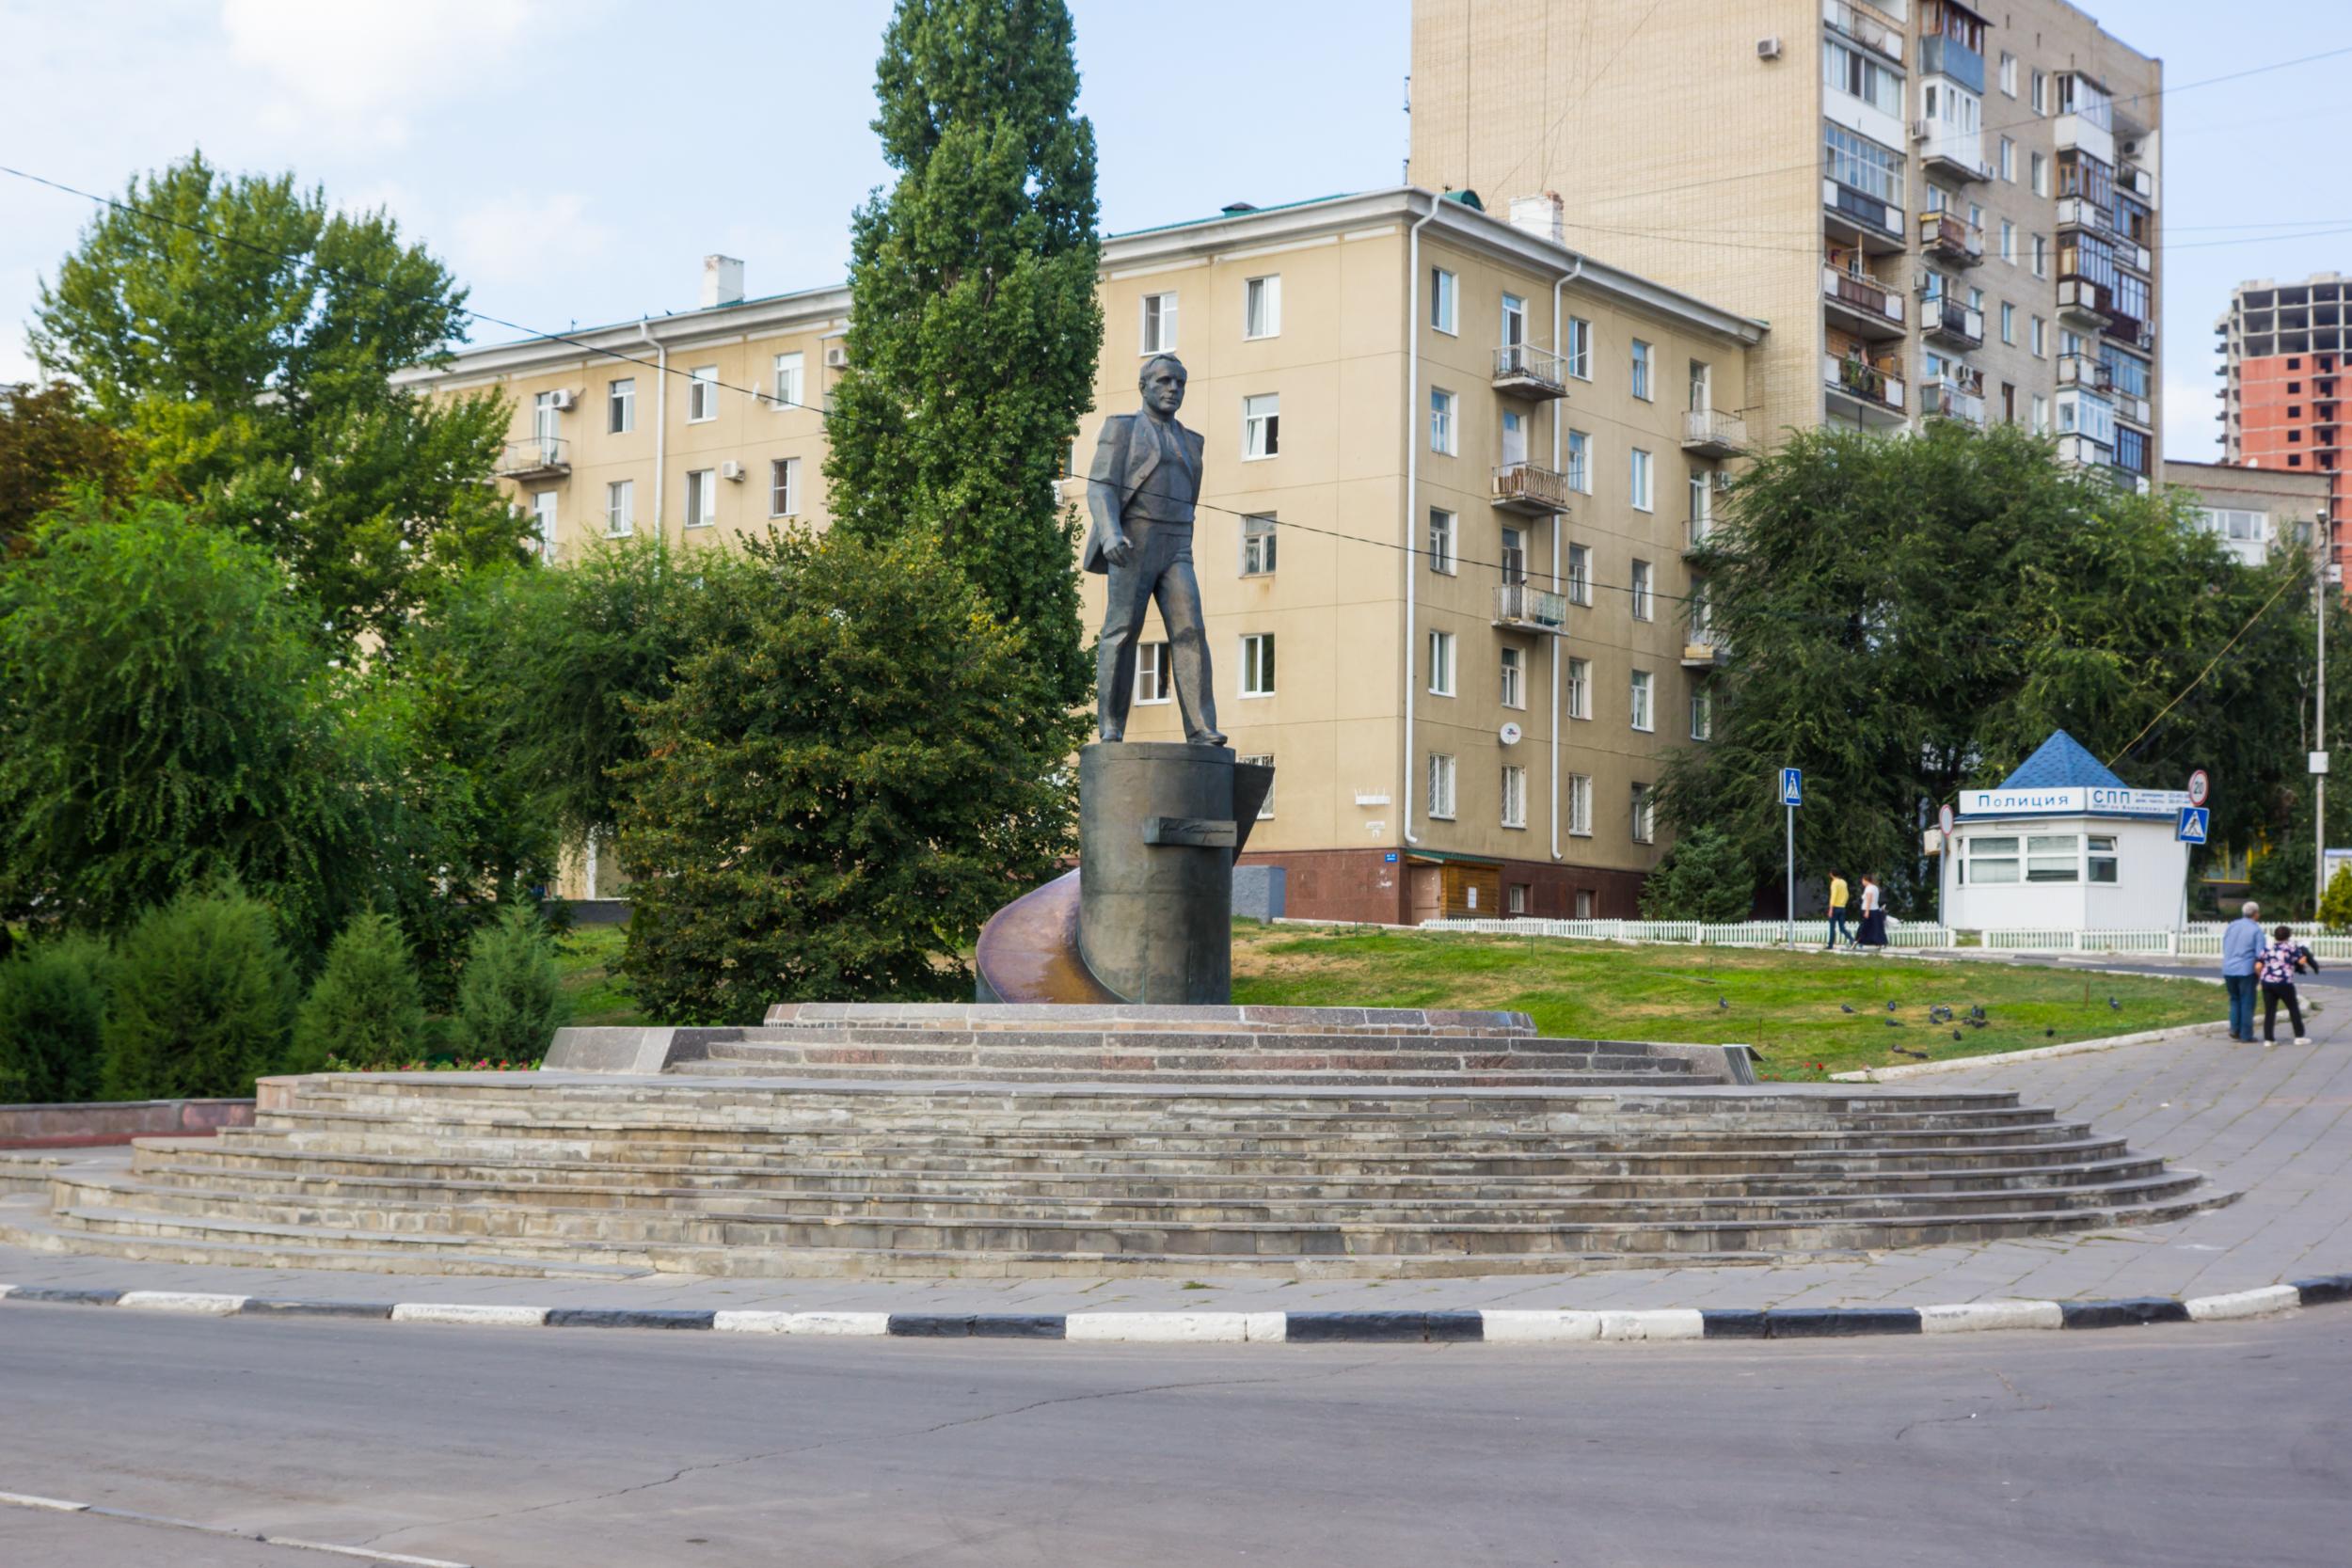 Monumento a Gagarin en cosmonautas paseo Saratov